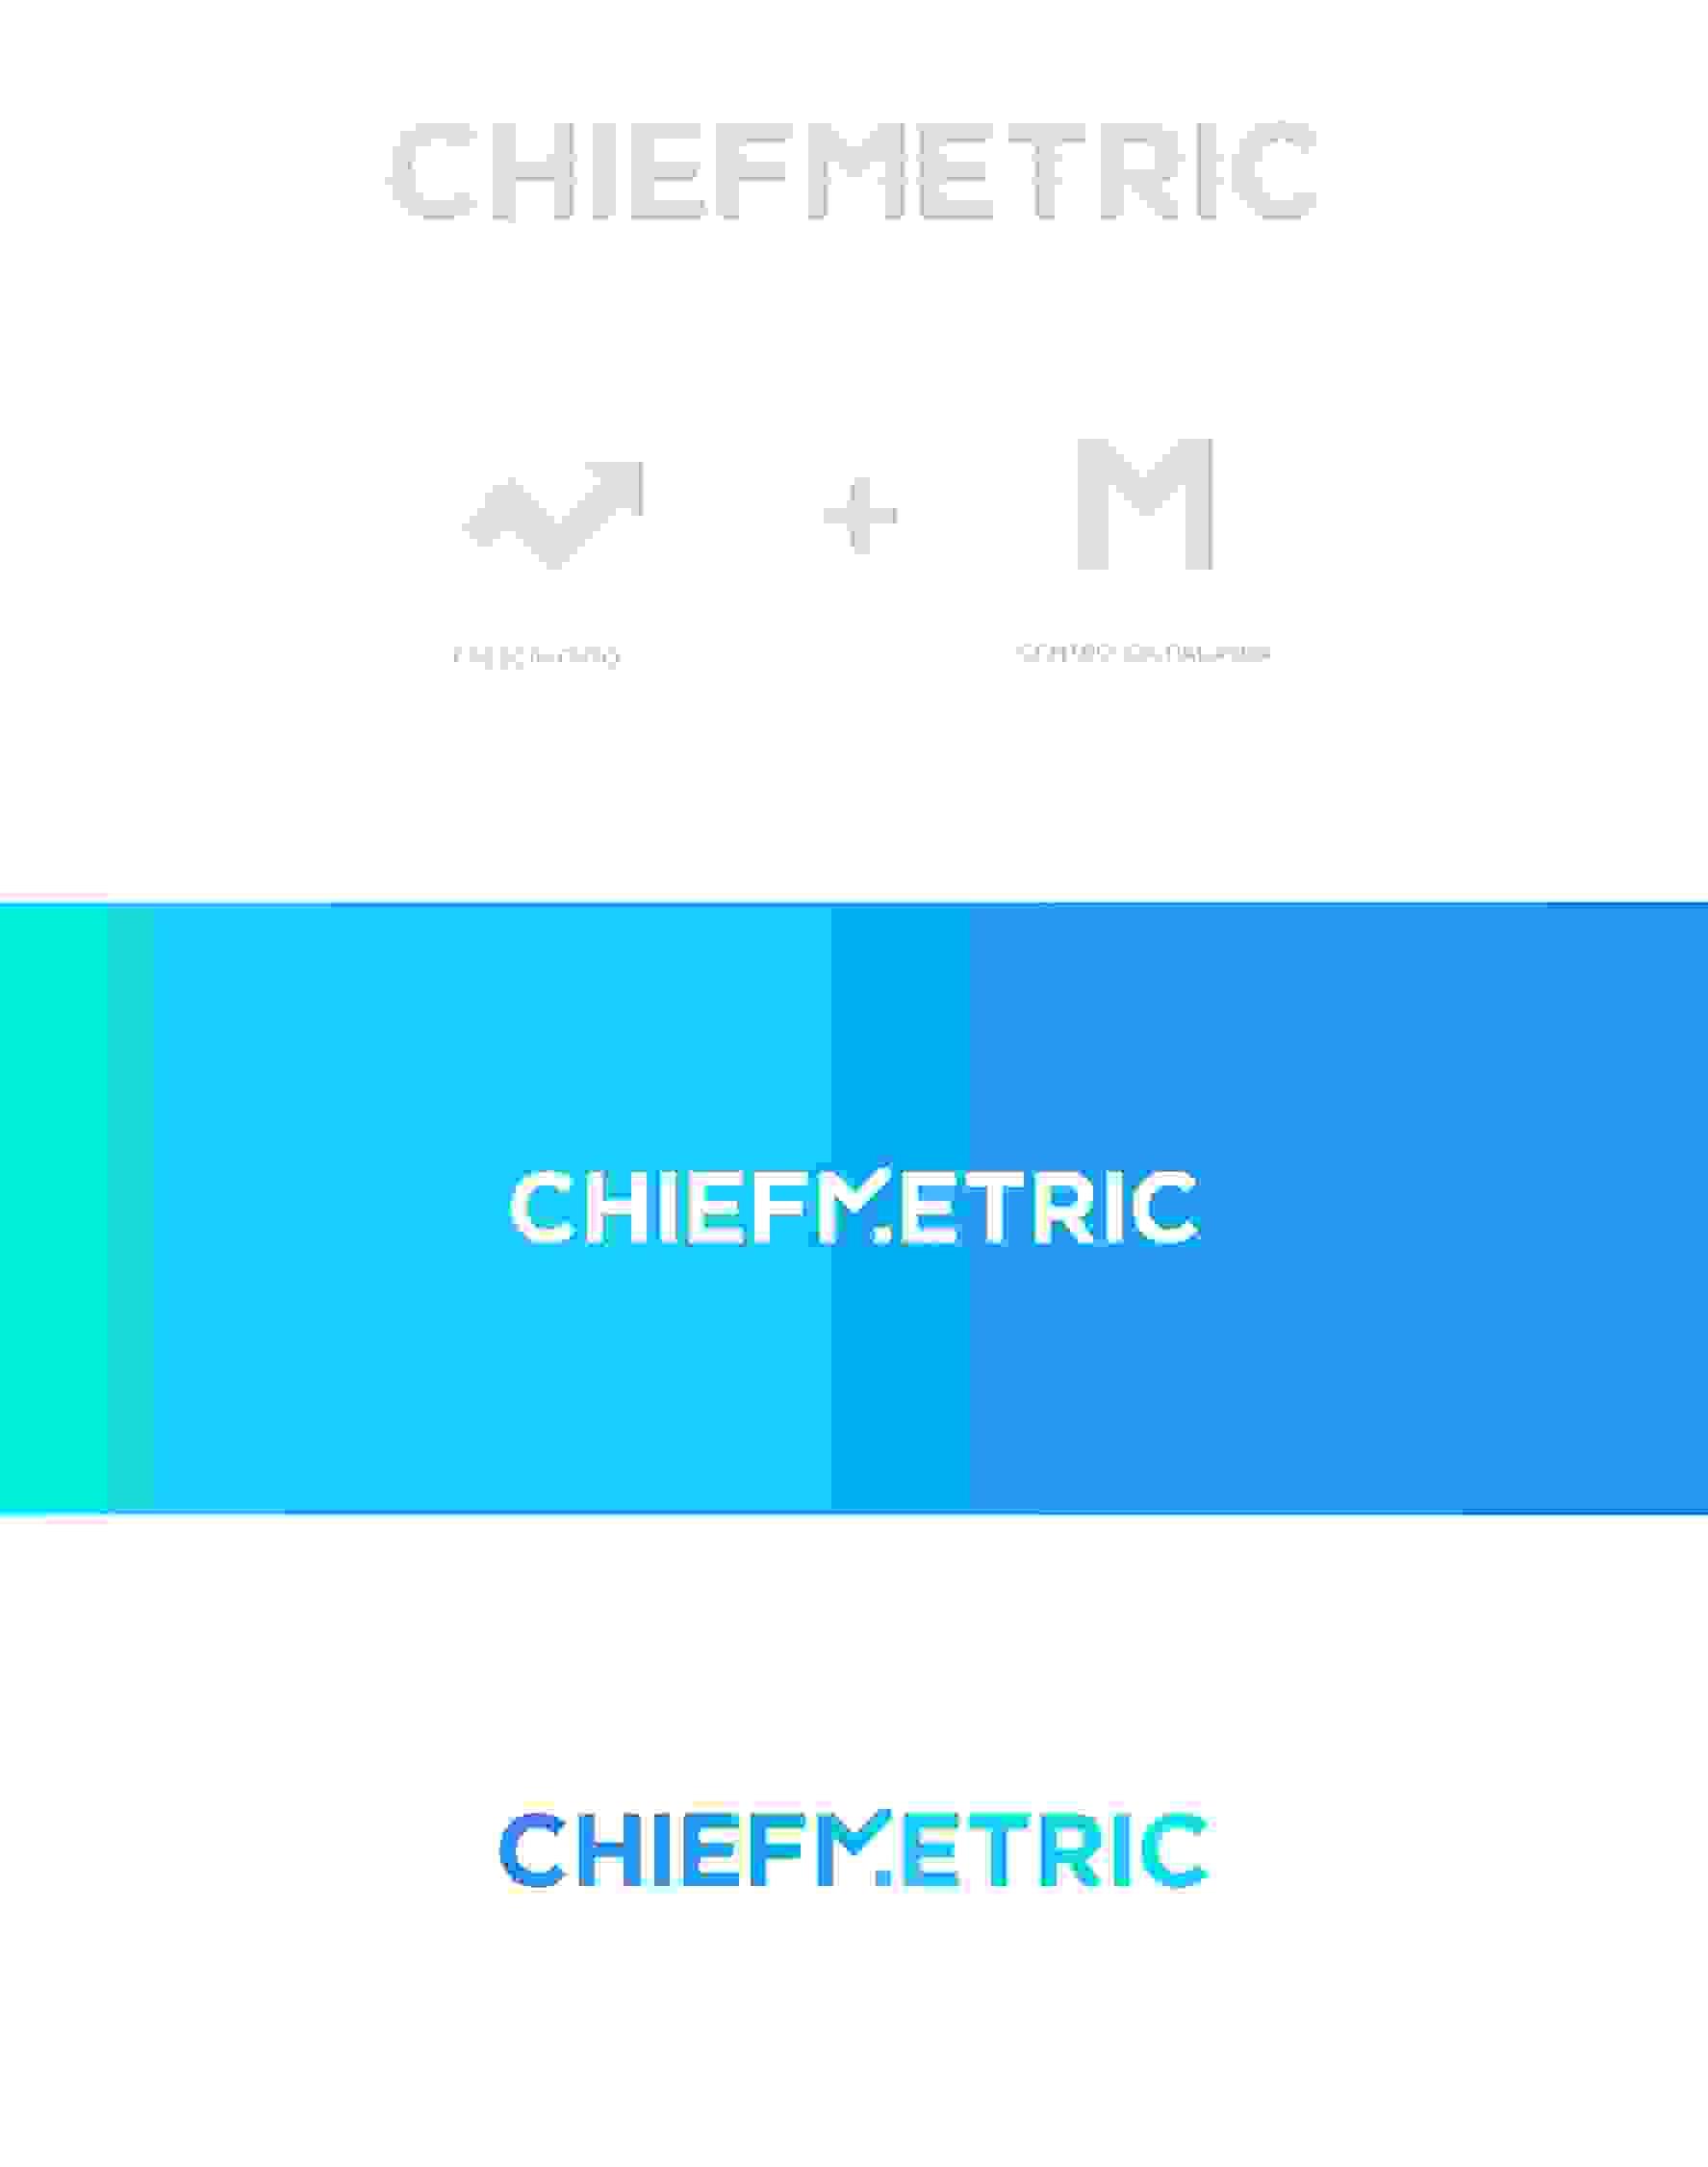 Chiefmetric-03